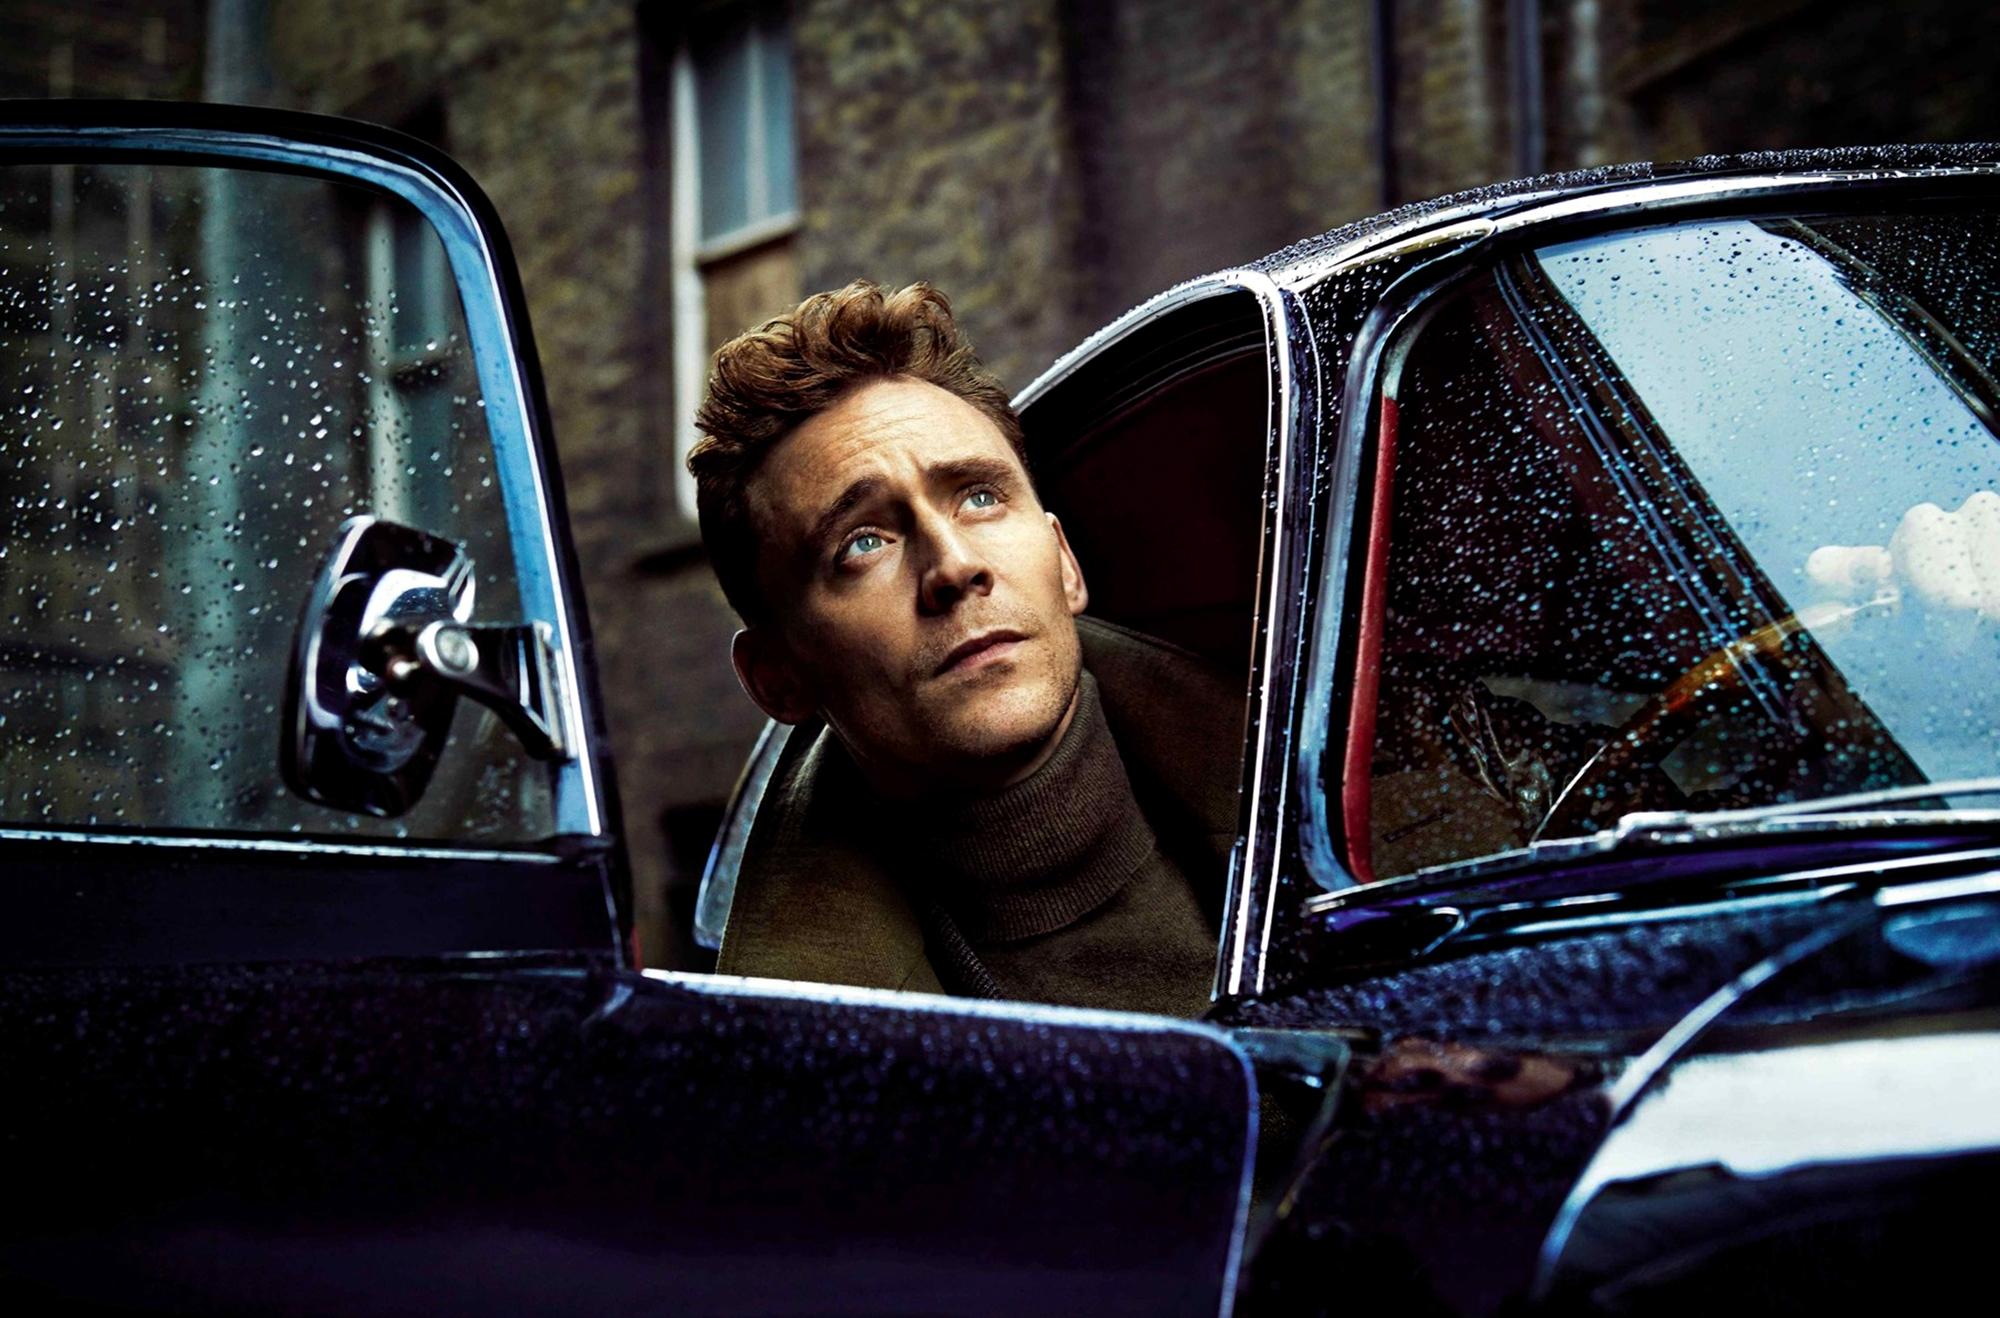 Frank Ocean Car Desktop Wallpaper Tom Hiddleston Wallpapers Archives Hdwallsource Com